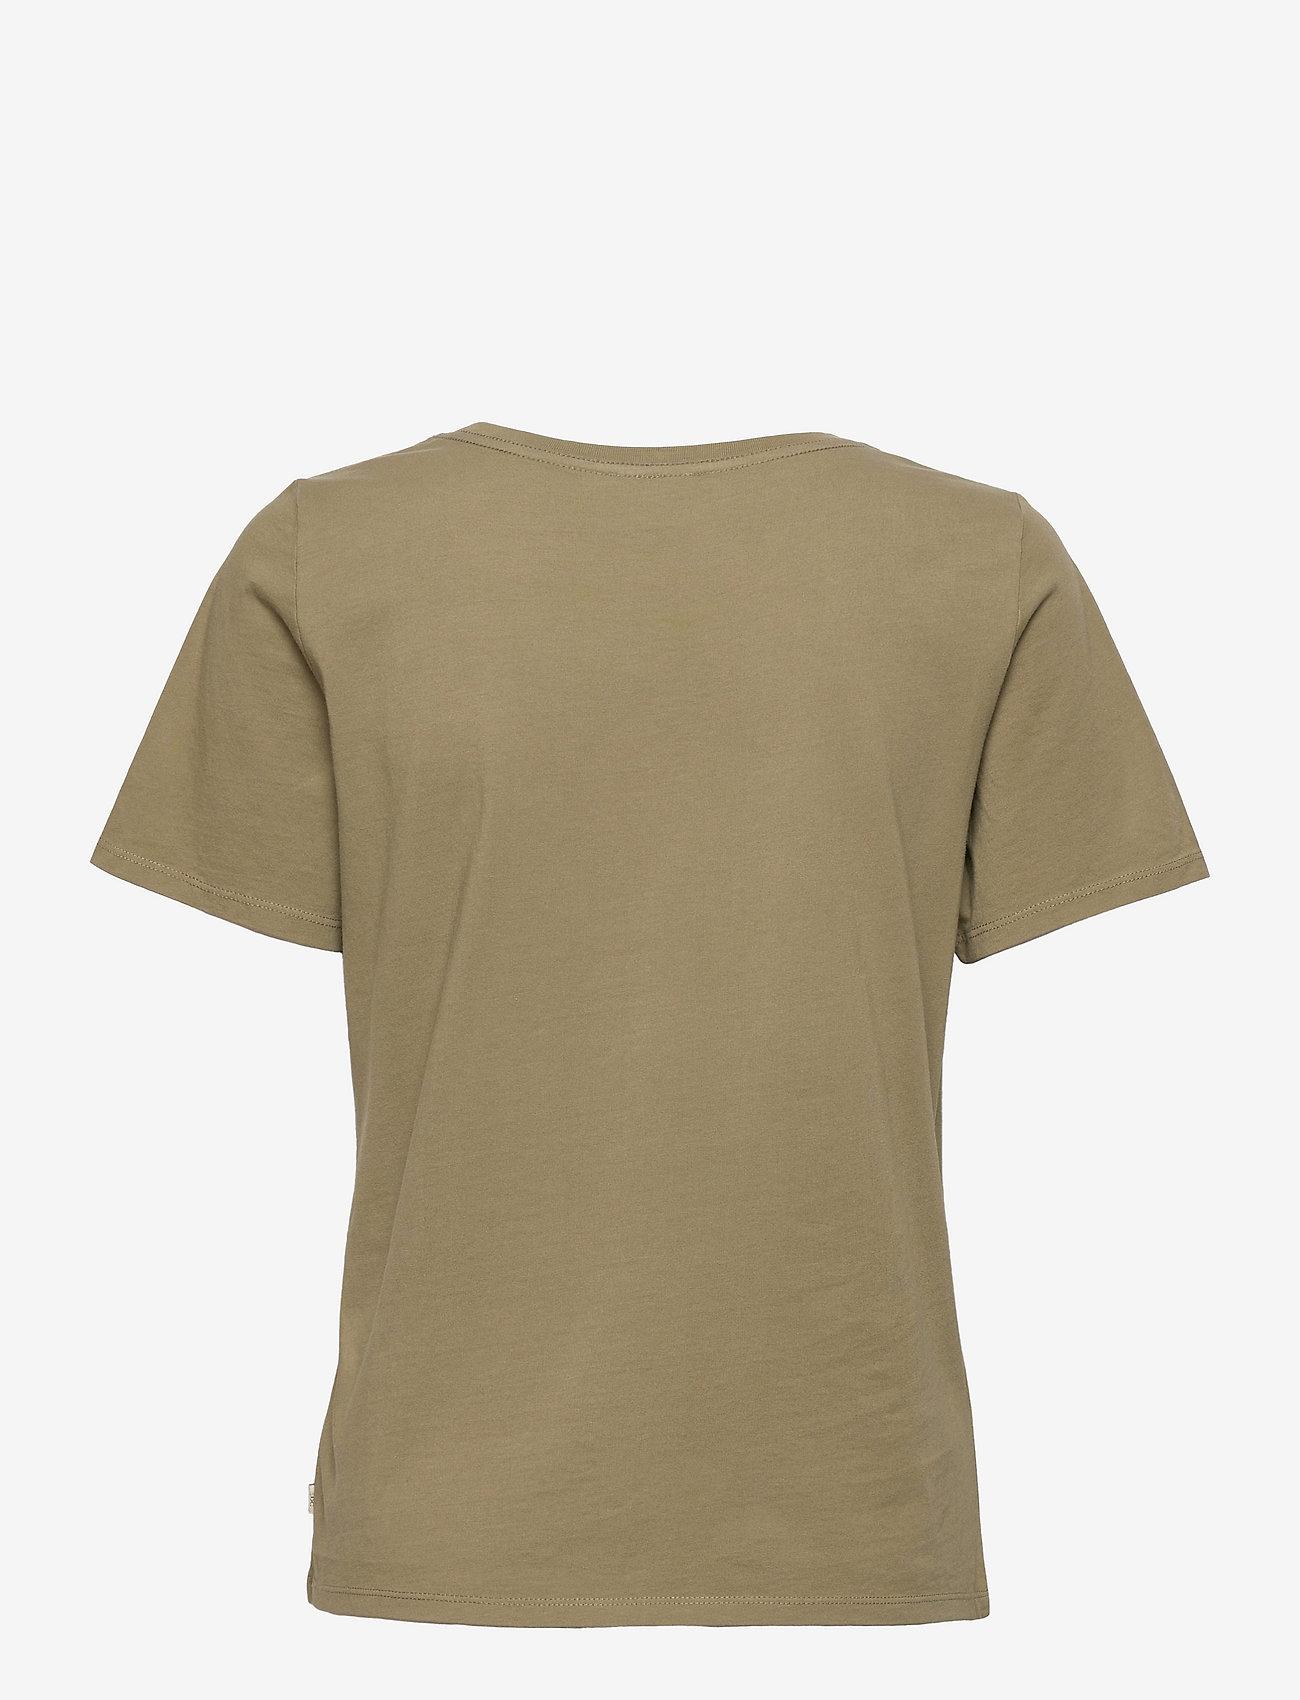 EDC by Esprit - T-Shirts - t-shirts - light khaki - 1